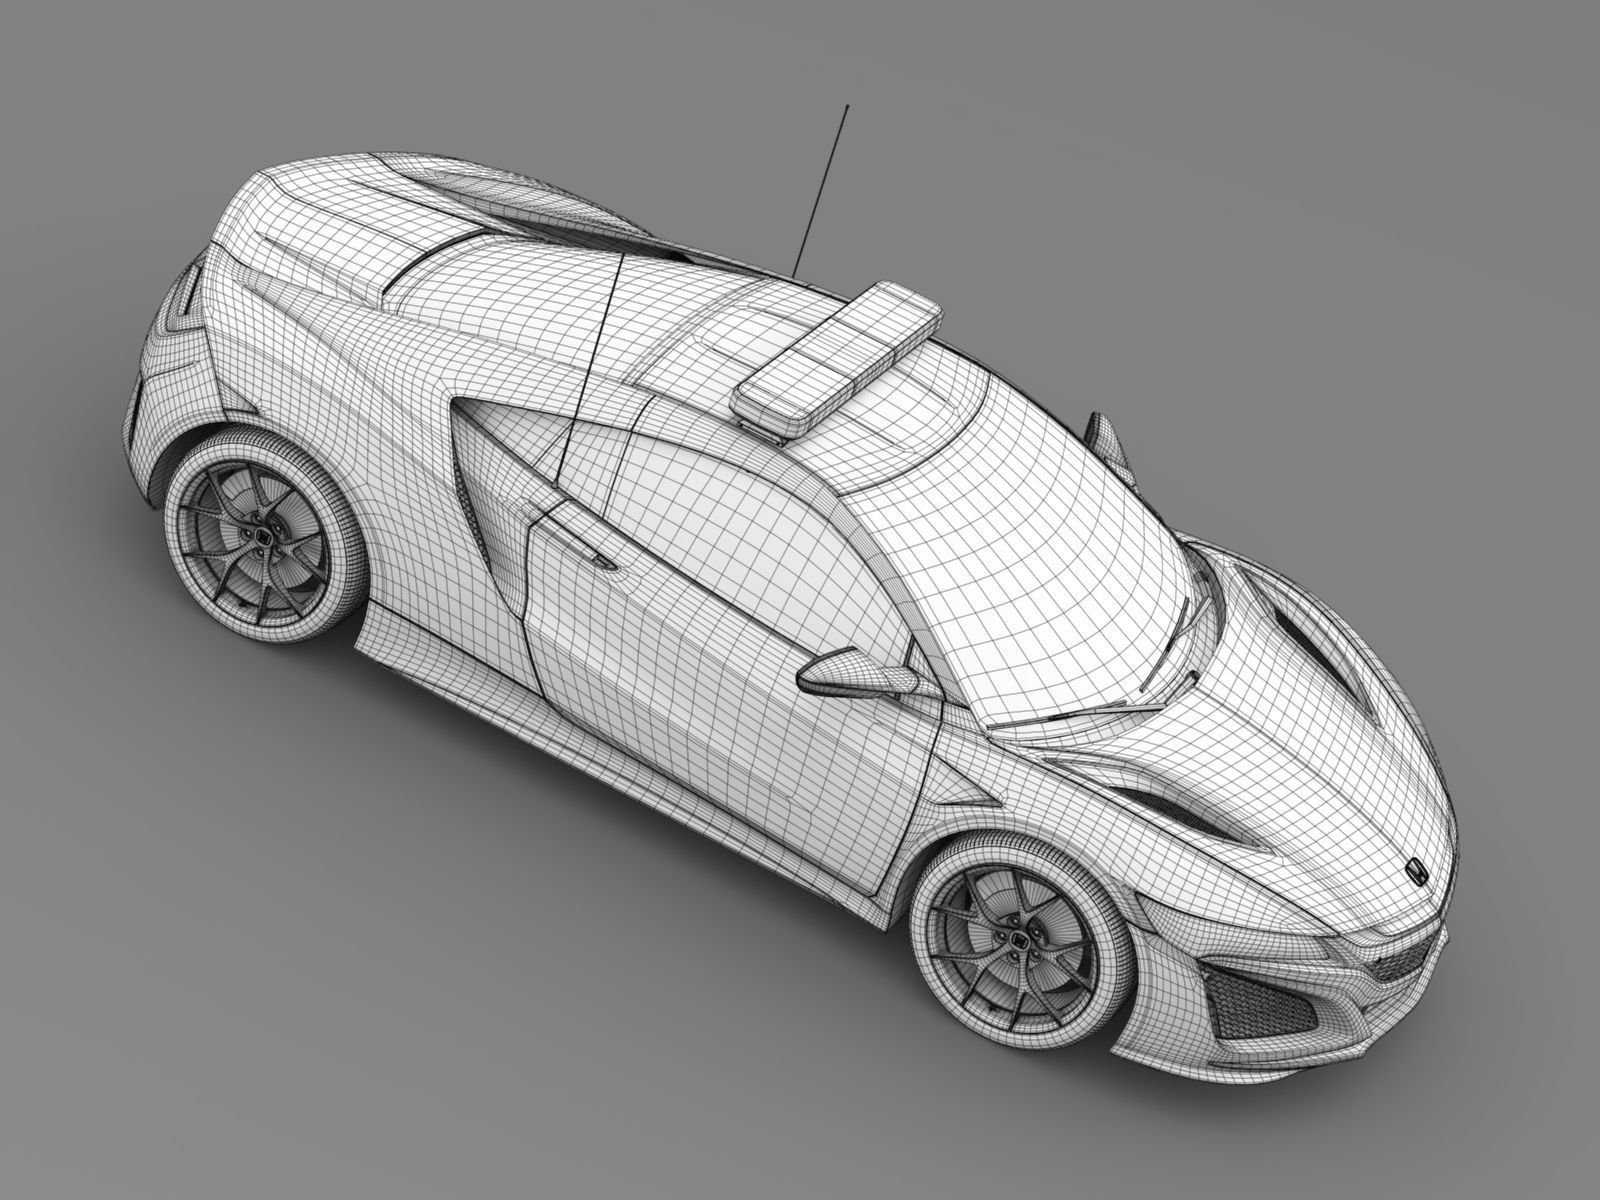 Honda Nsx 2017 Safety Car 3d Model Cgtrader